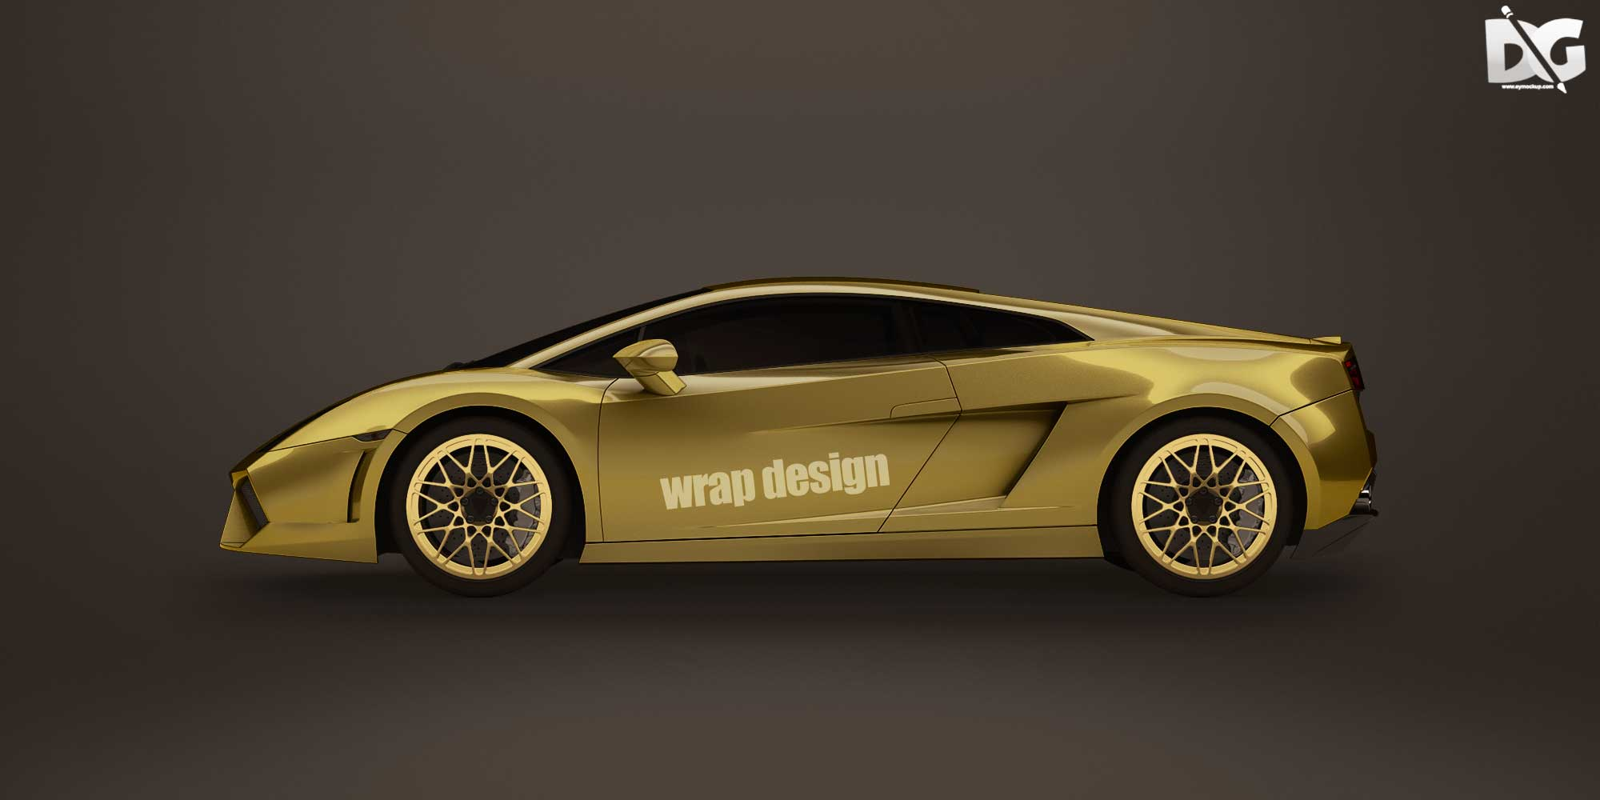 Free lamborgini Wrap Design Mockup